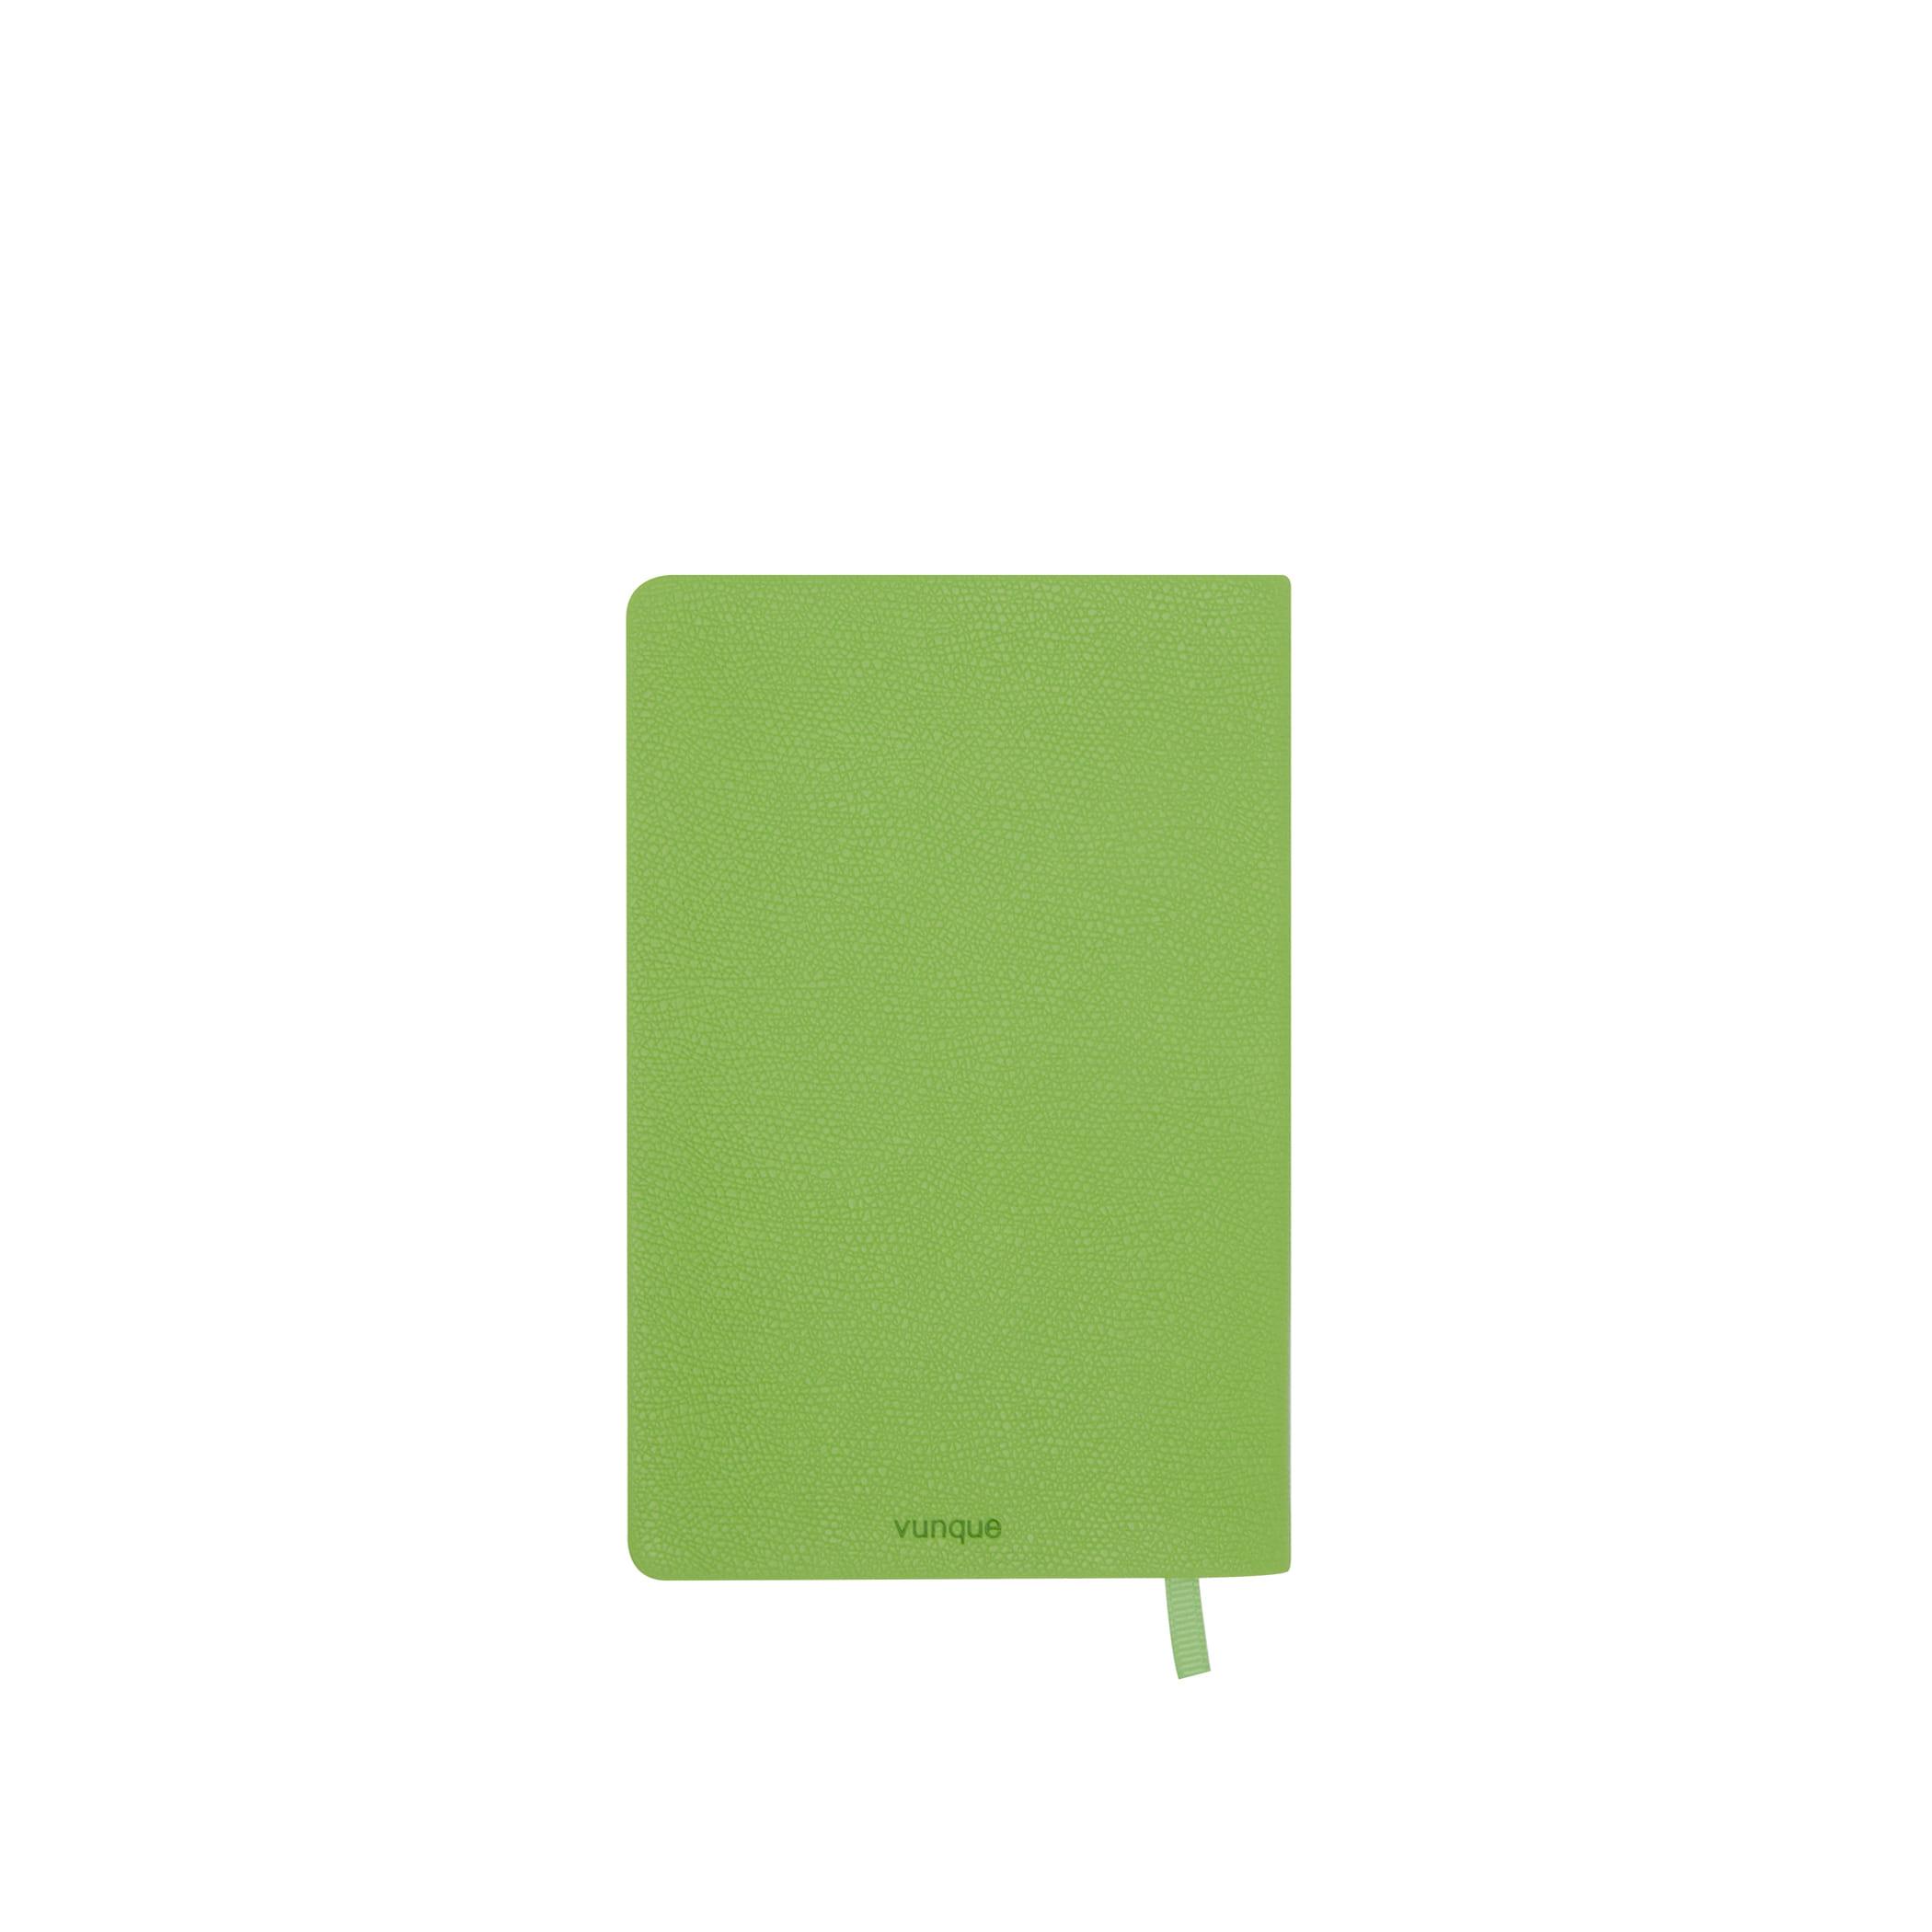 vunque note Small Green